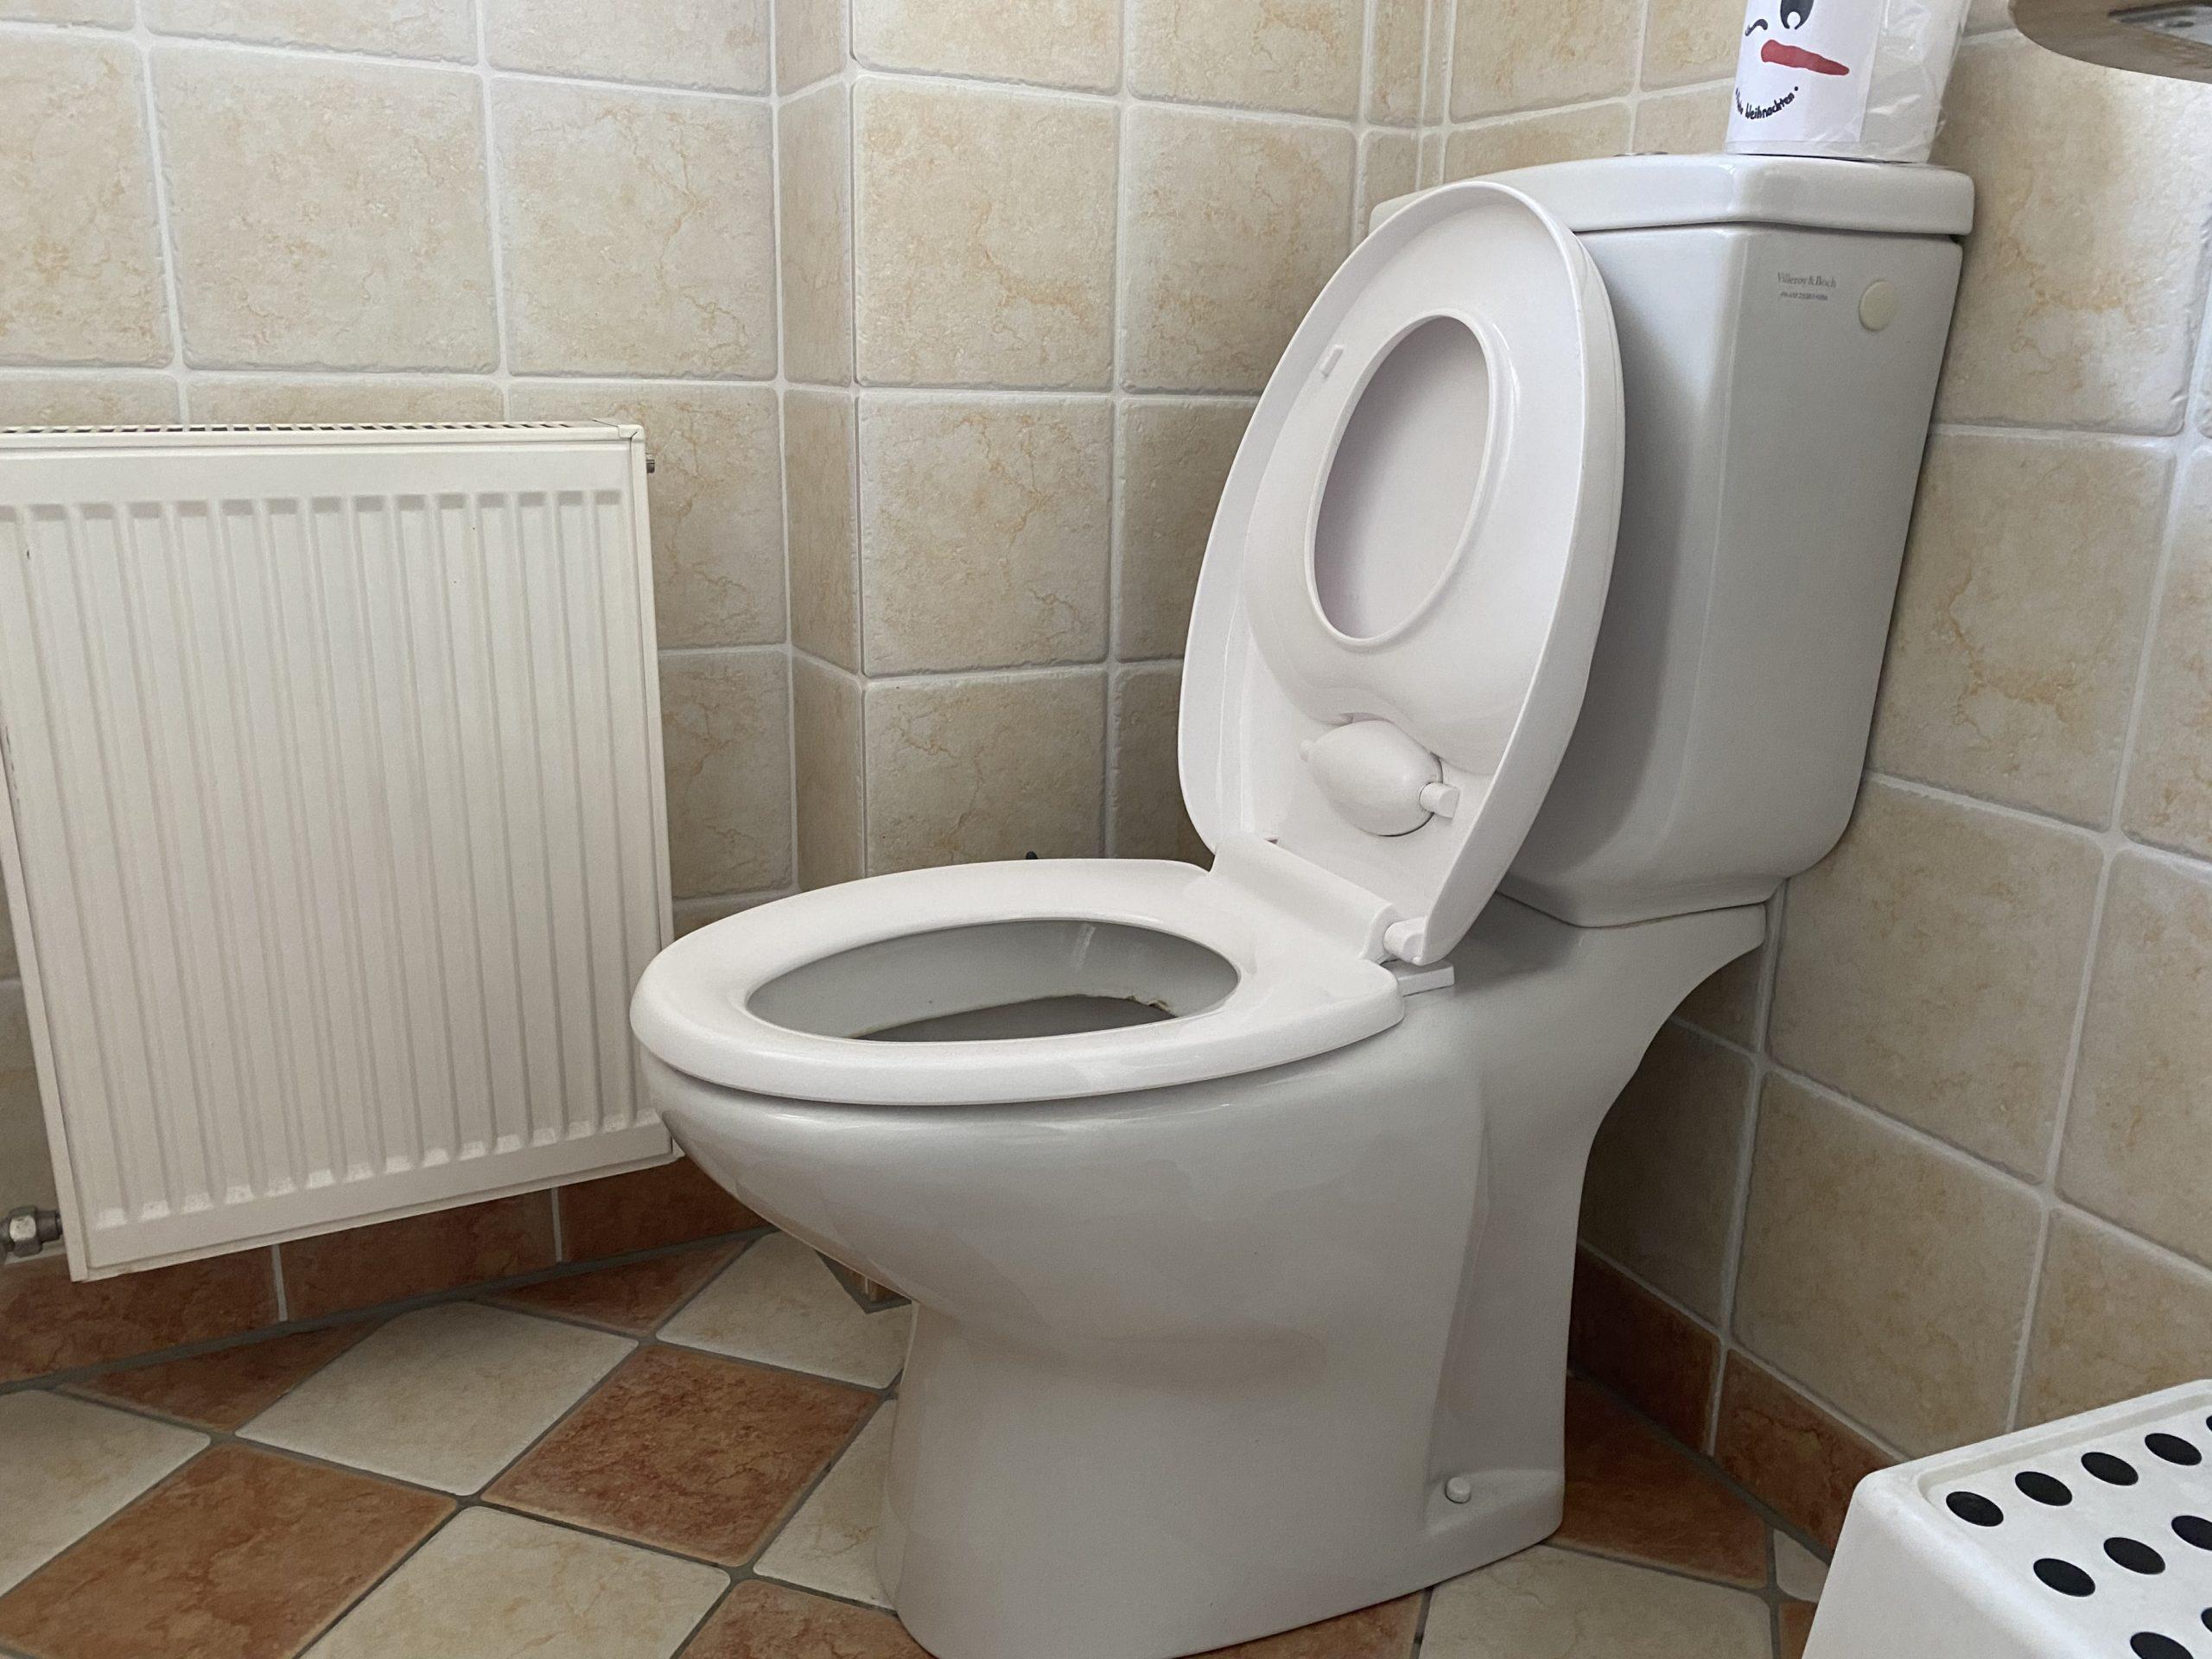 WC Sitz mit Kindersitz